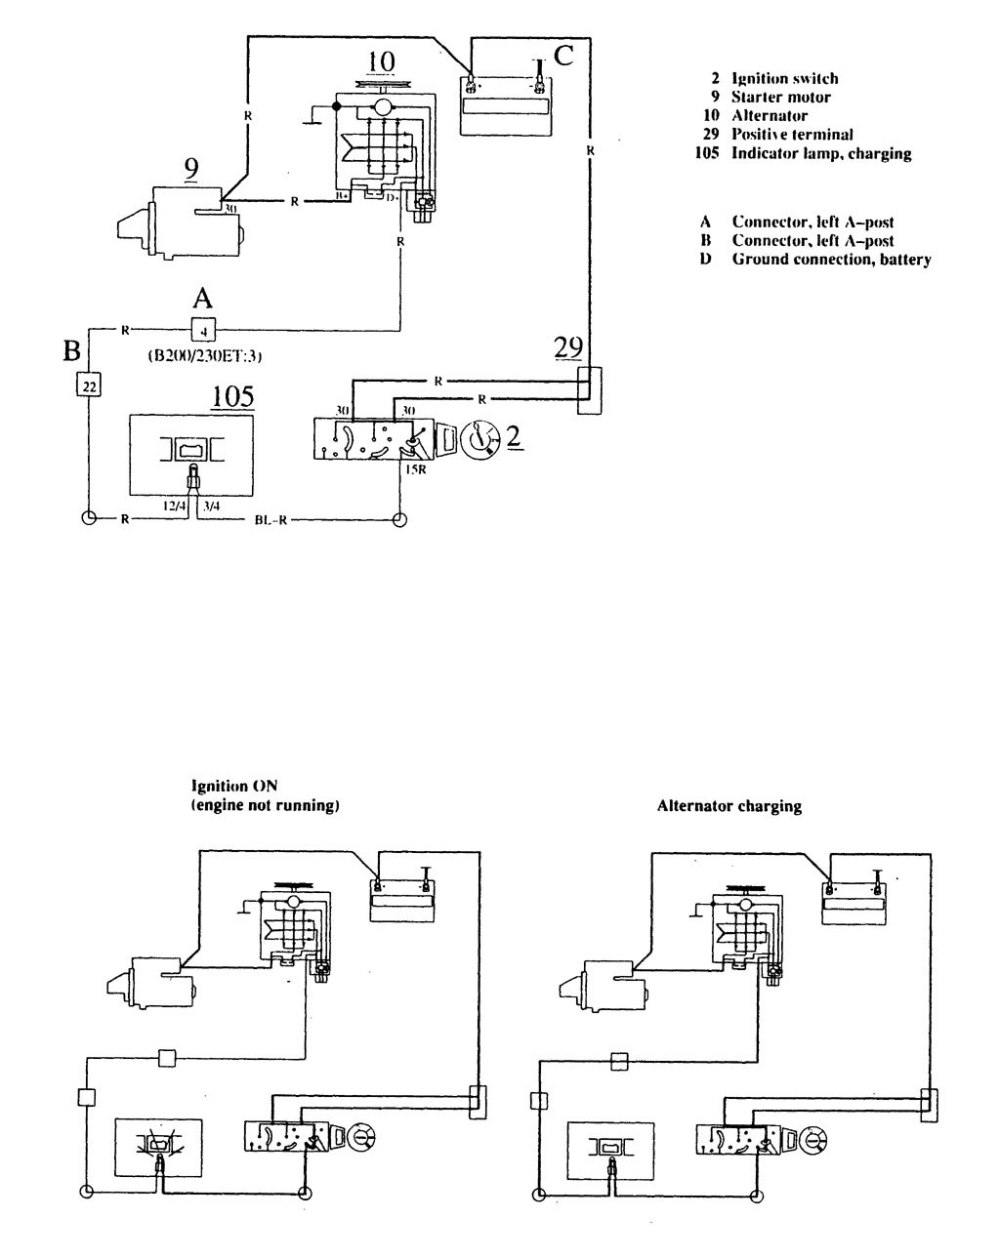 medium resolution of 1989 volvo 240 battery wiring diagrams u2022 wiring diagram 1986 volvo 240 wiring diagrams 1990 volvo 240 wiring manual